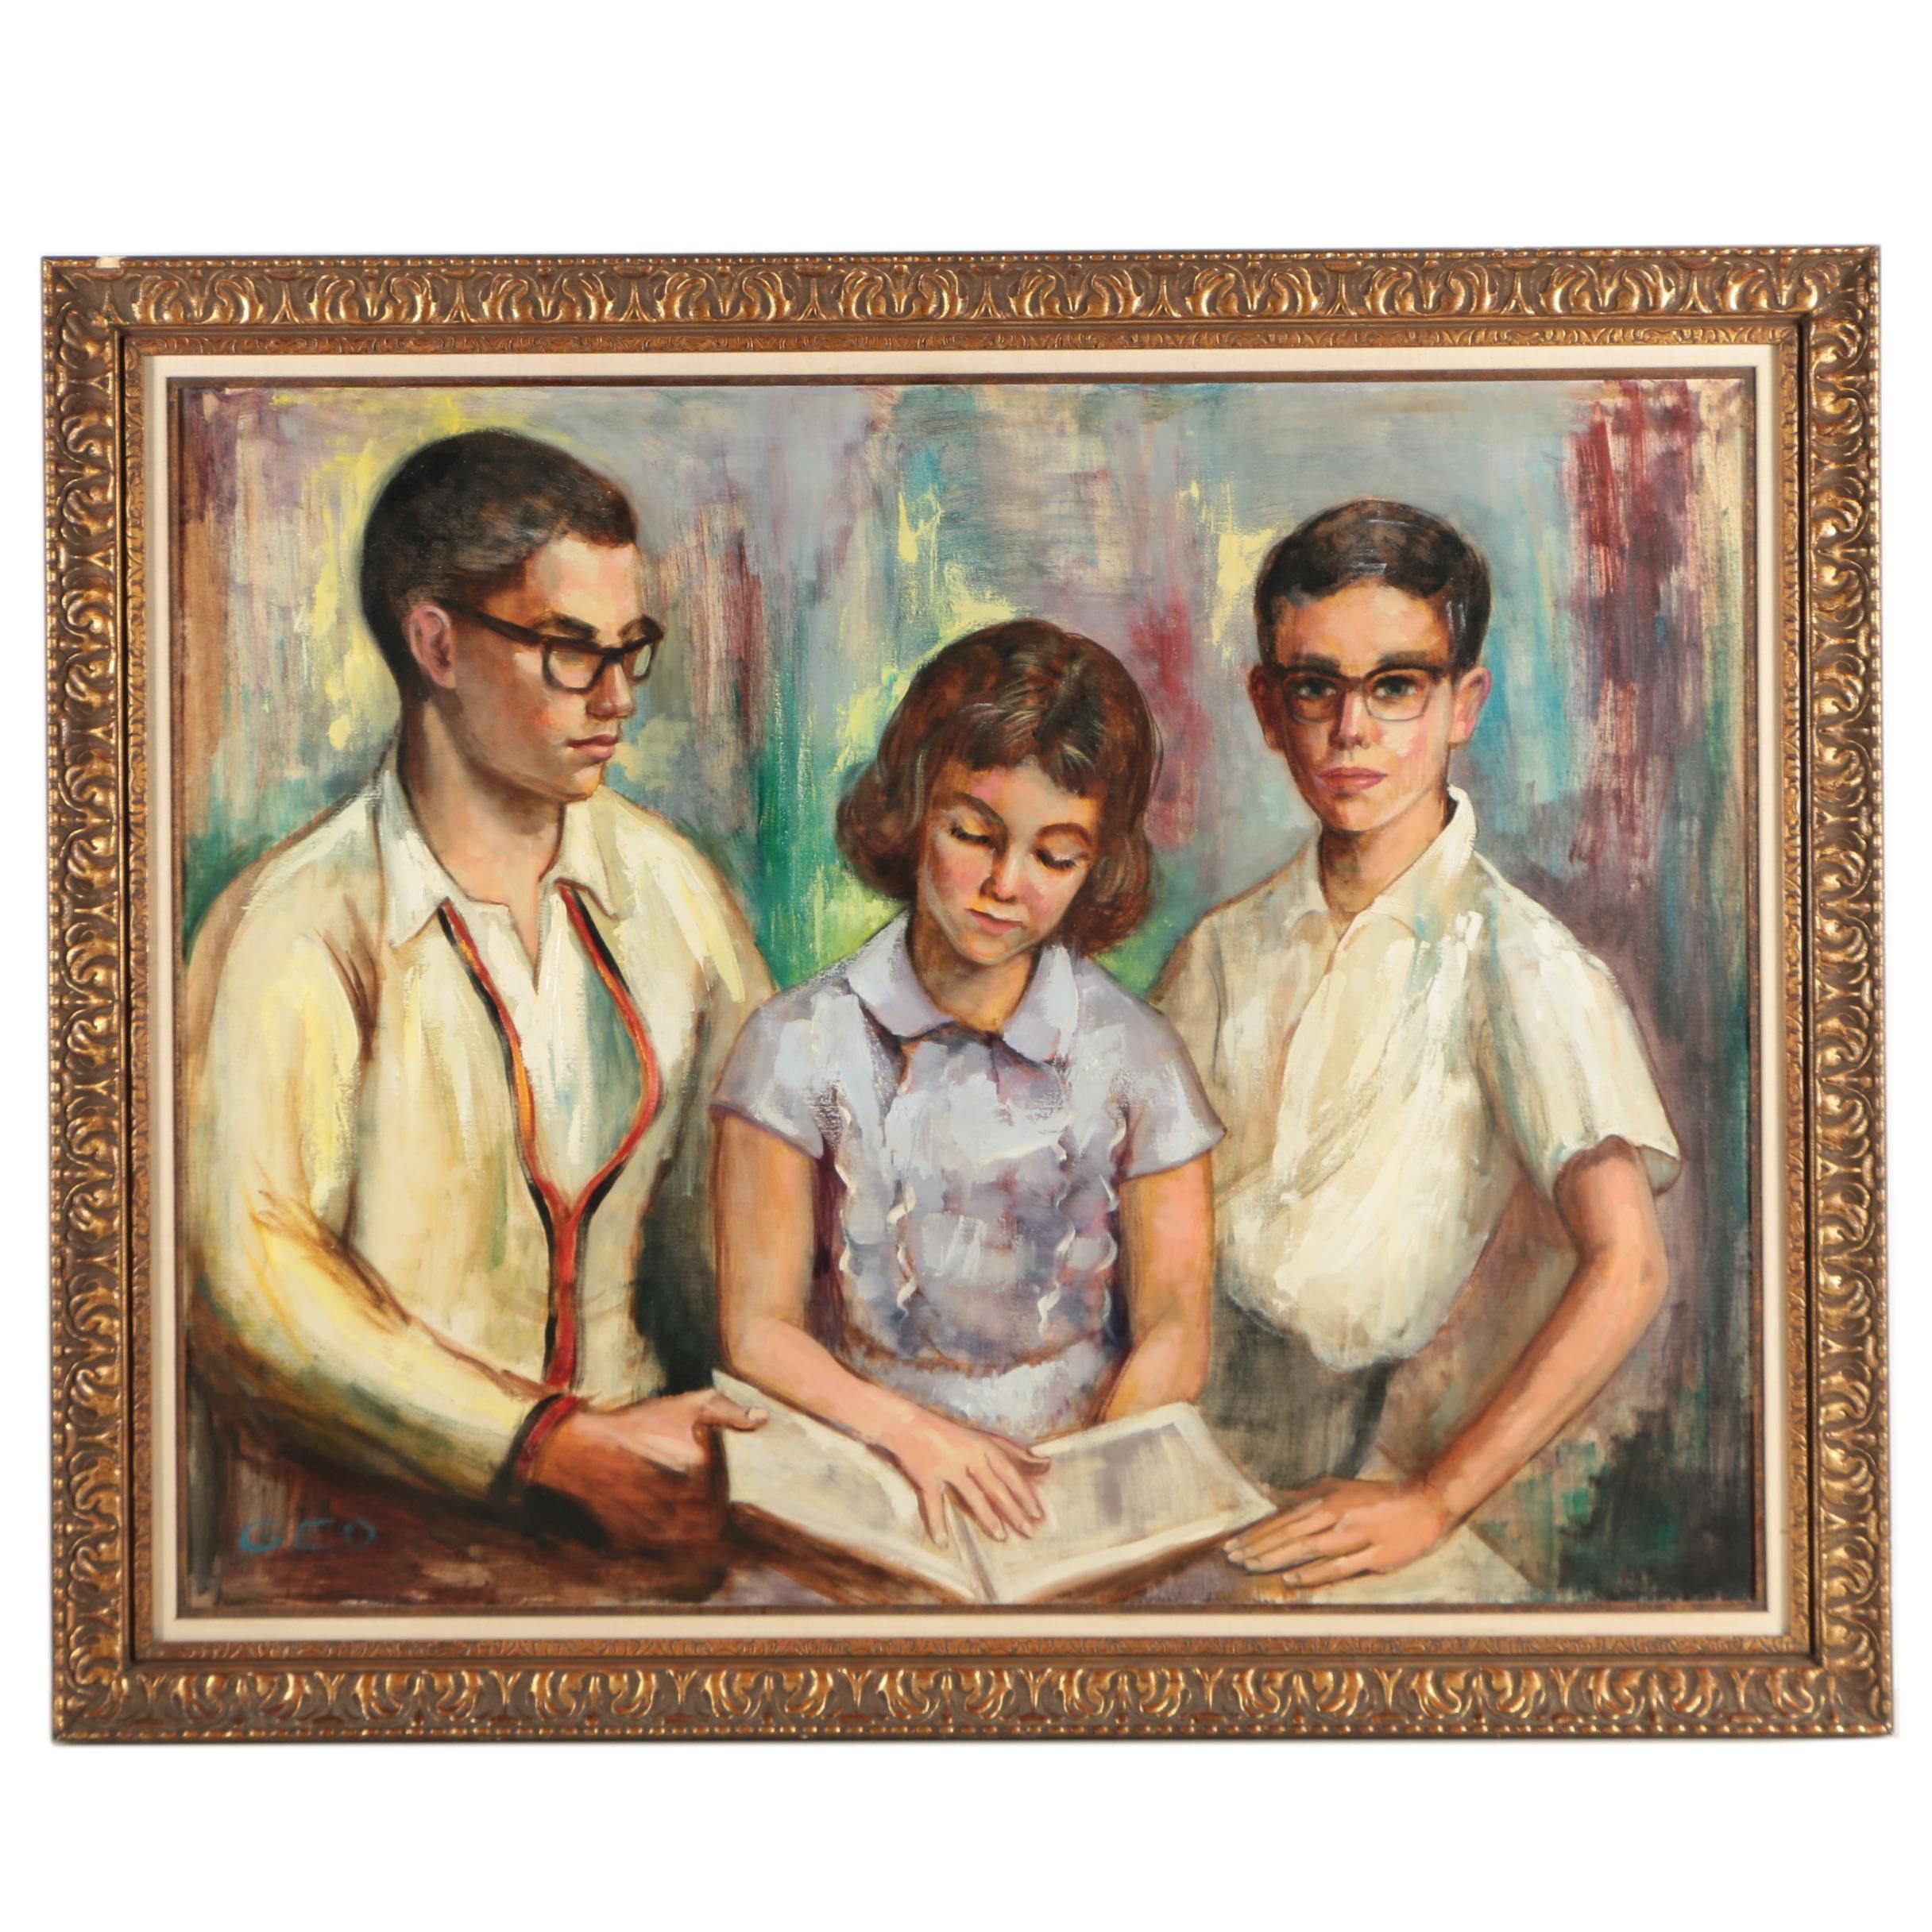 GEO Oil Painting of Children Reading